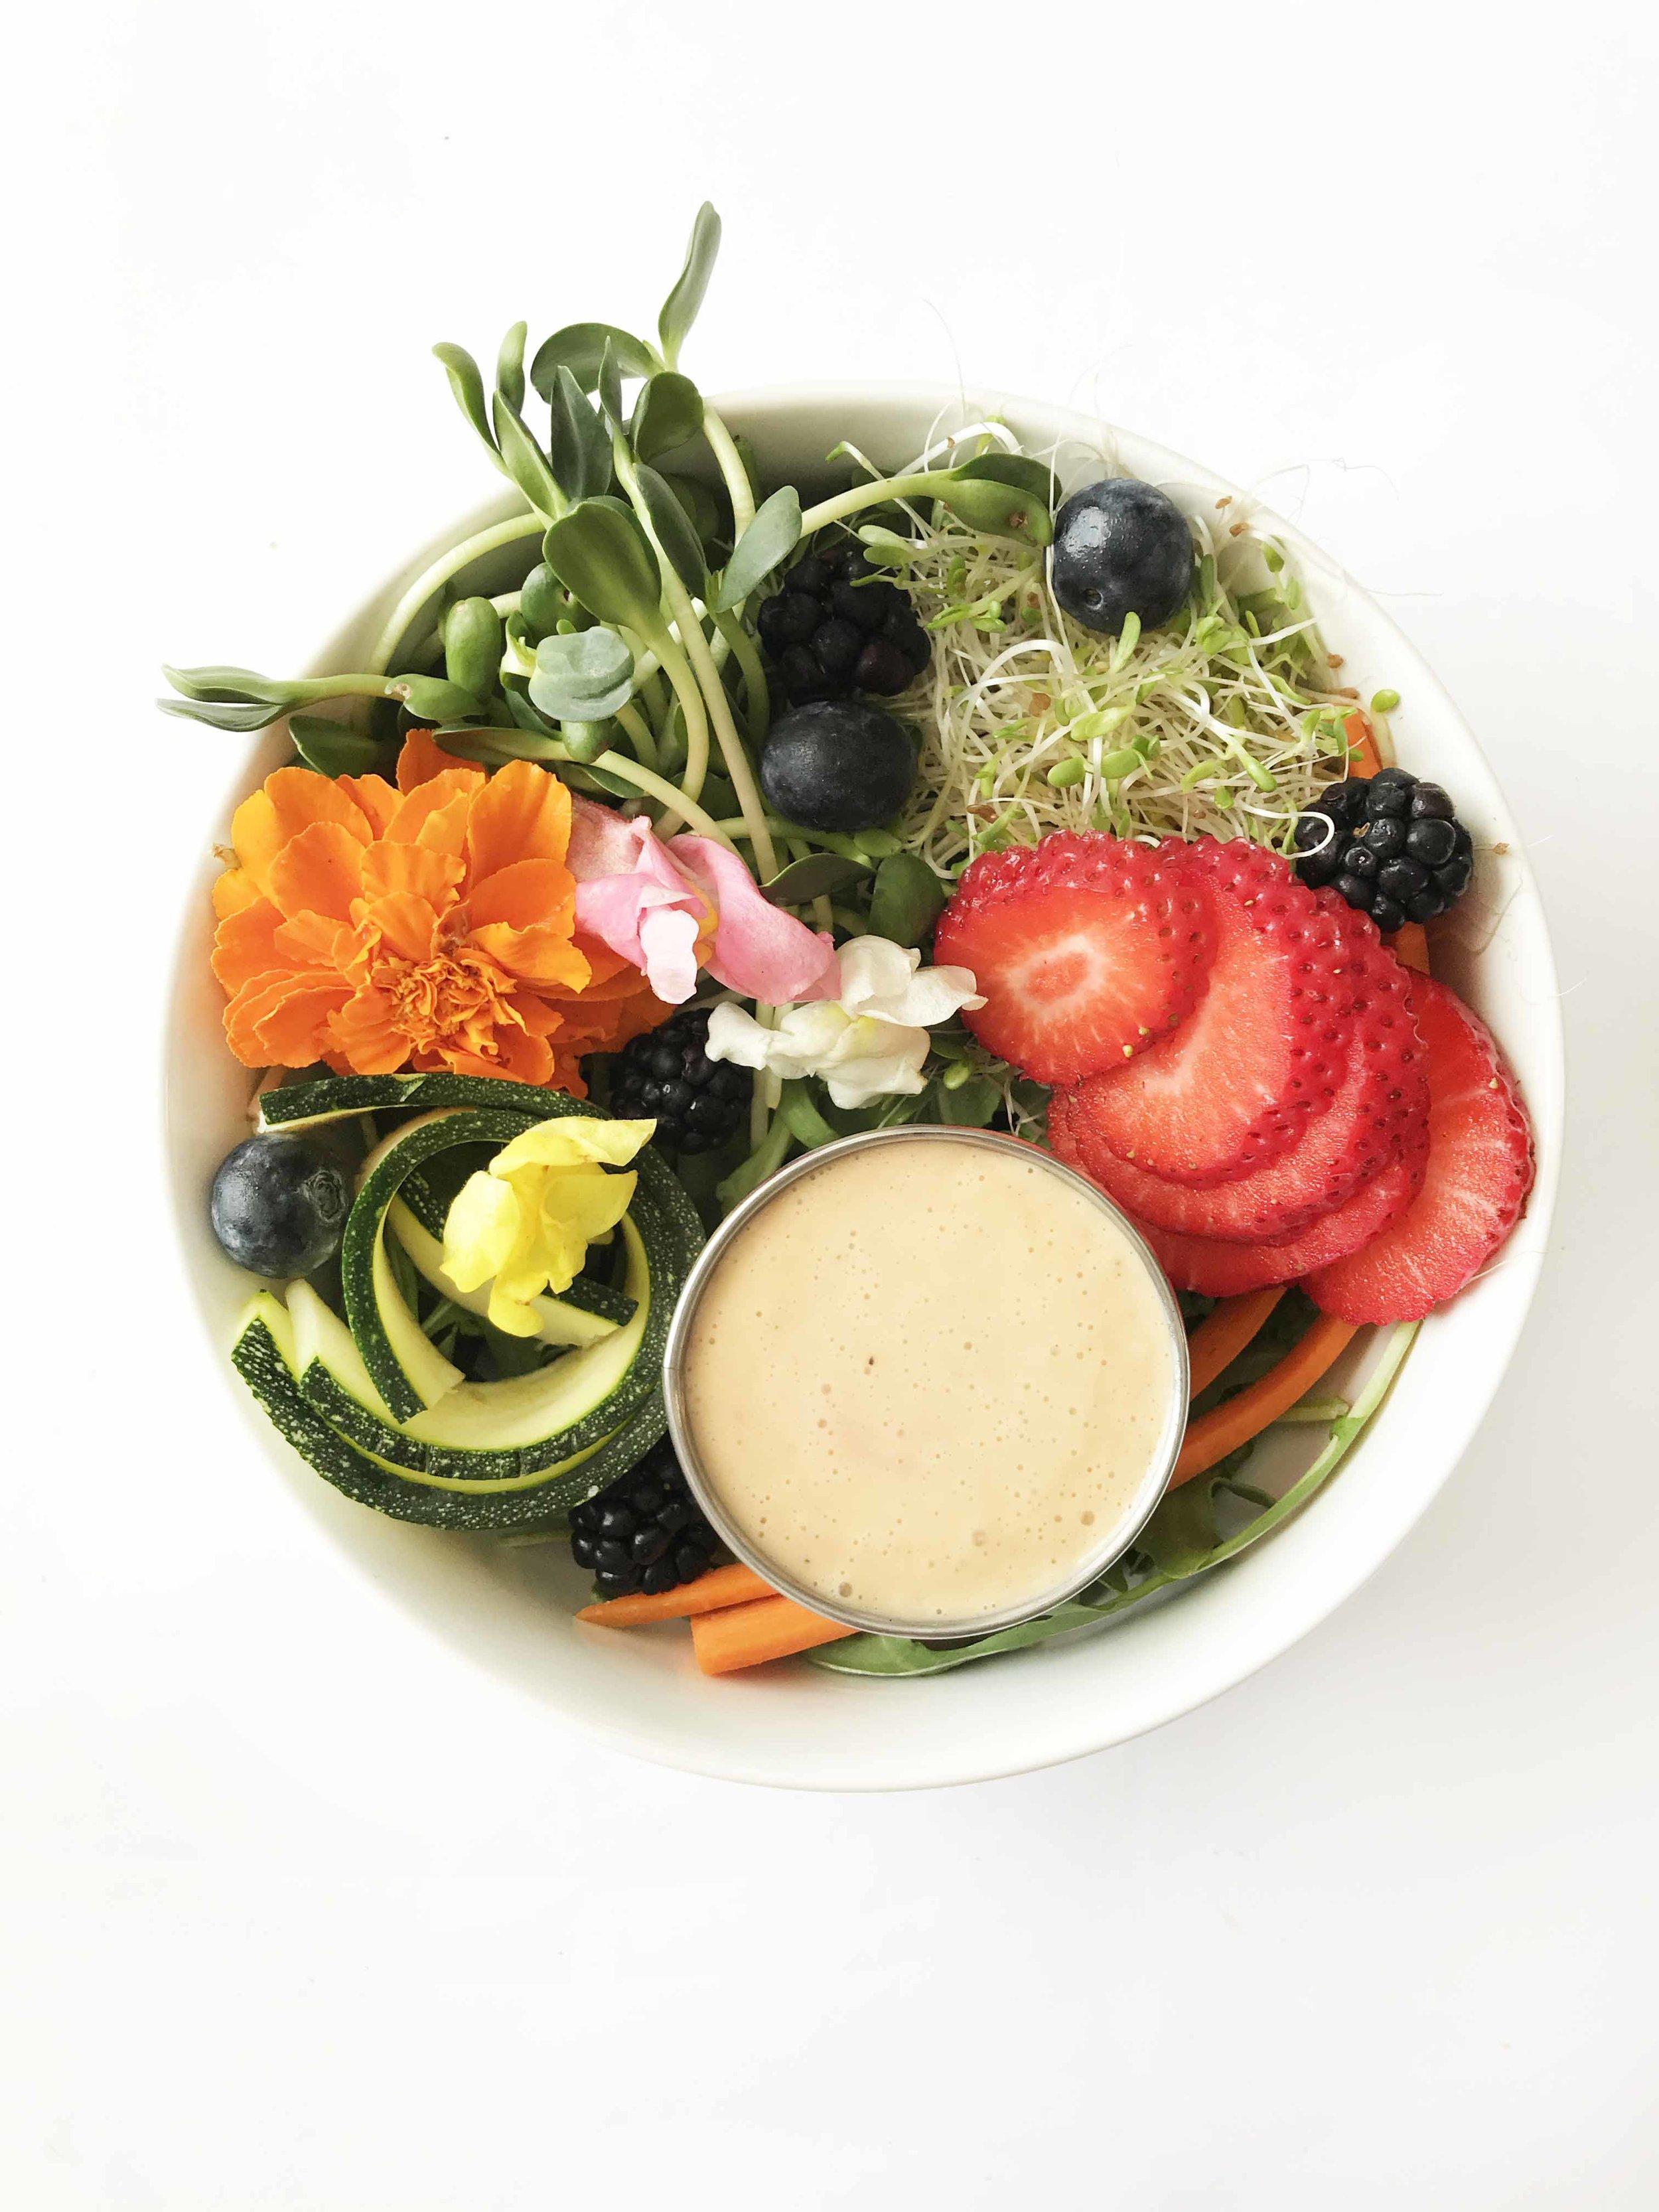 fairy-garden-salad8.jpg